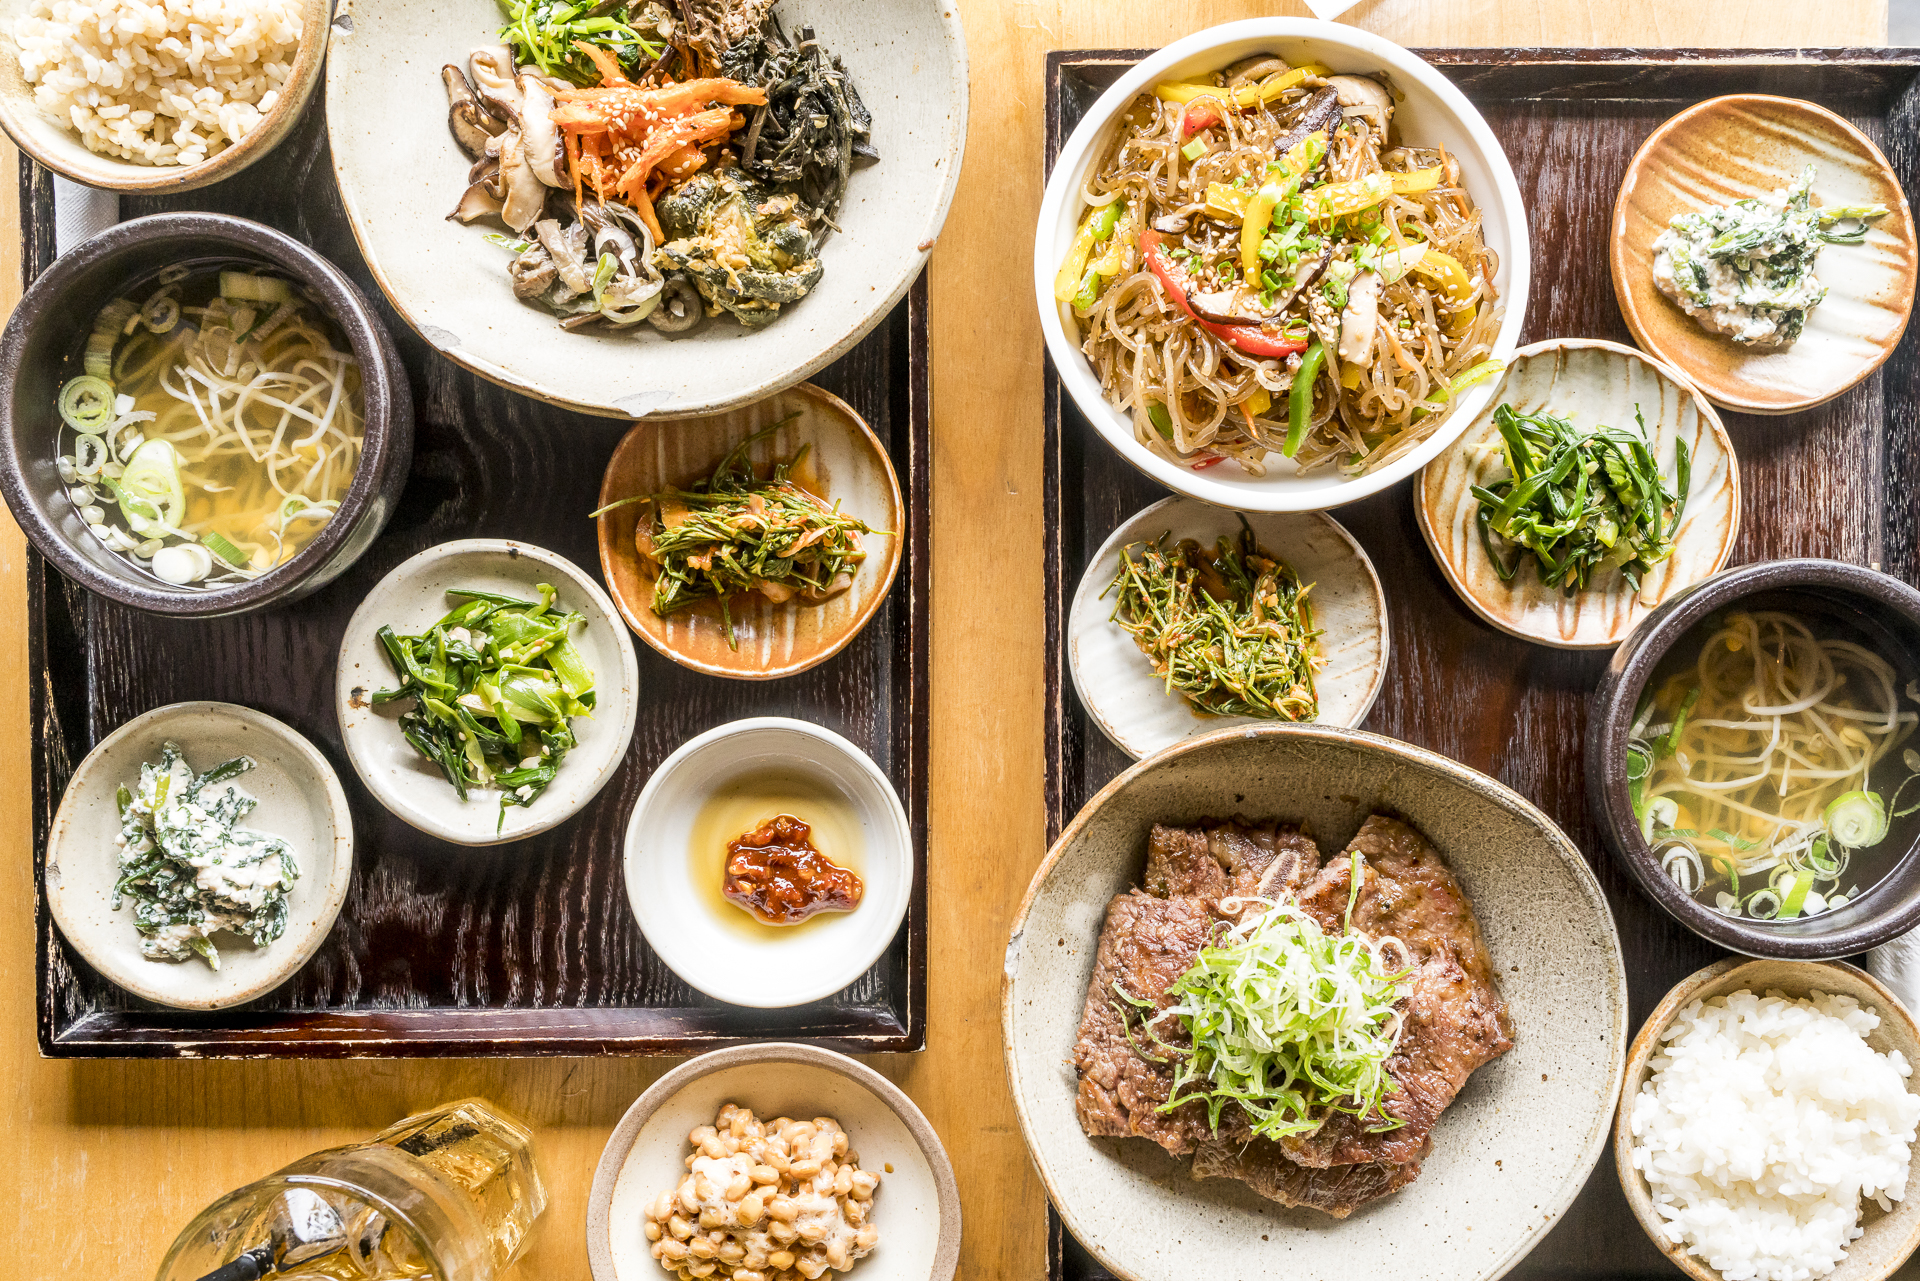 Restaurant Park Itaewon Seoul